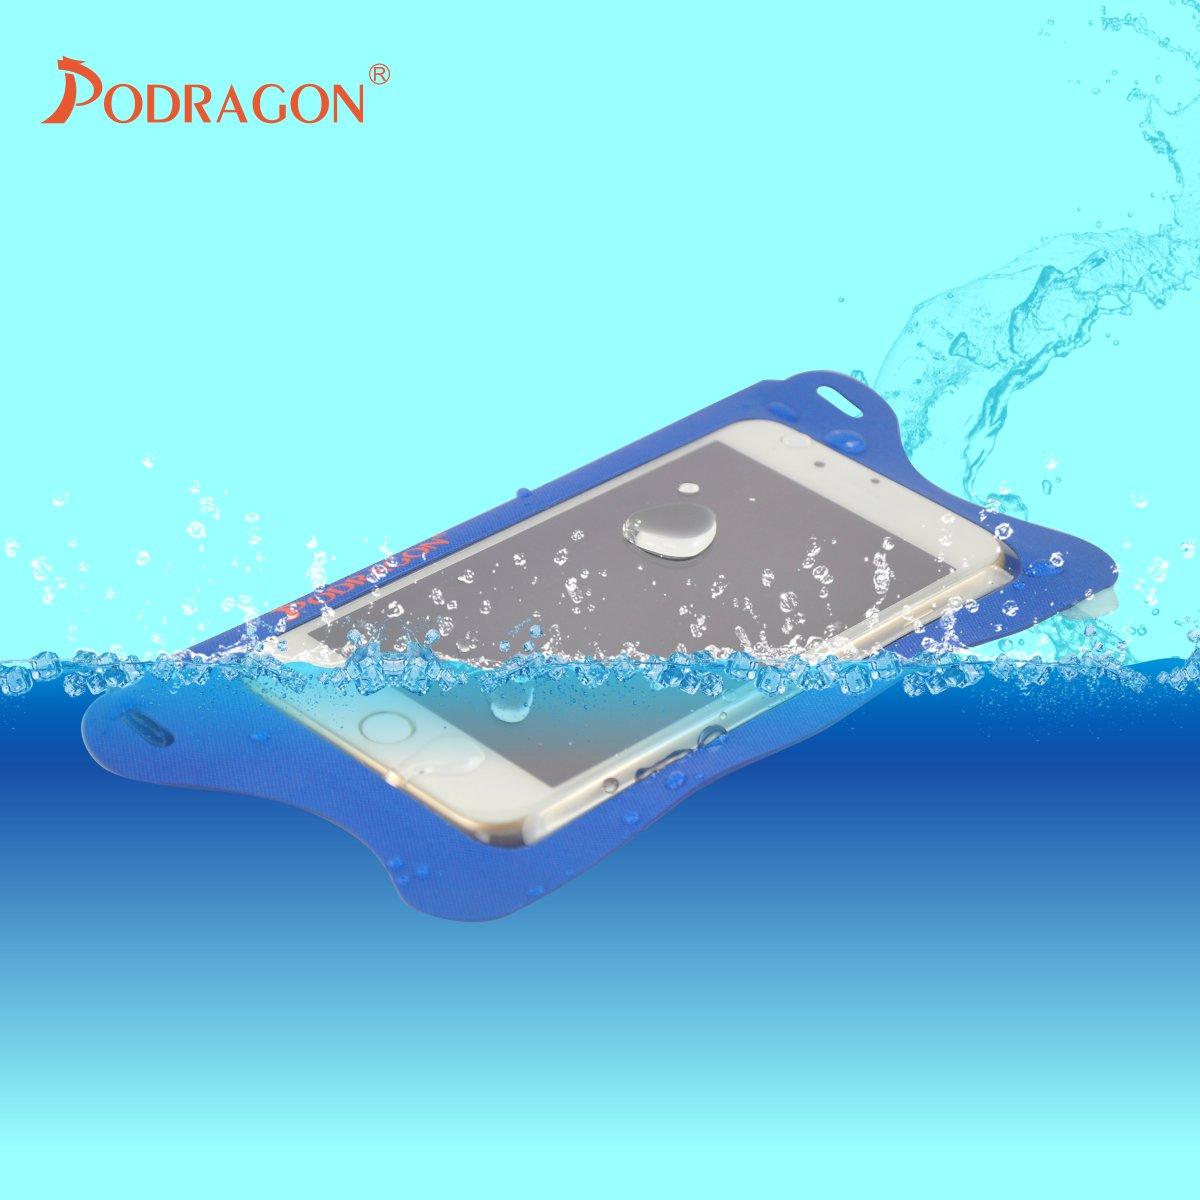 p20p30pro苹果XR/XSmax/Podragon手机防水袋潜水套漂流泡温泉游泳